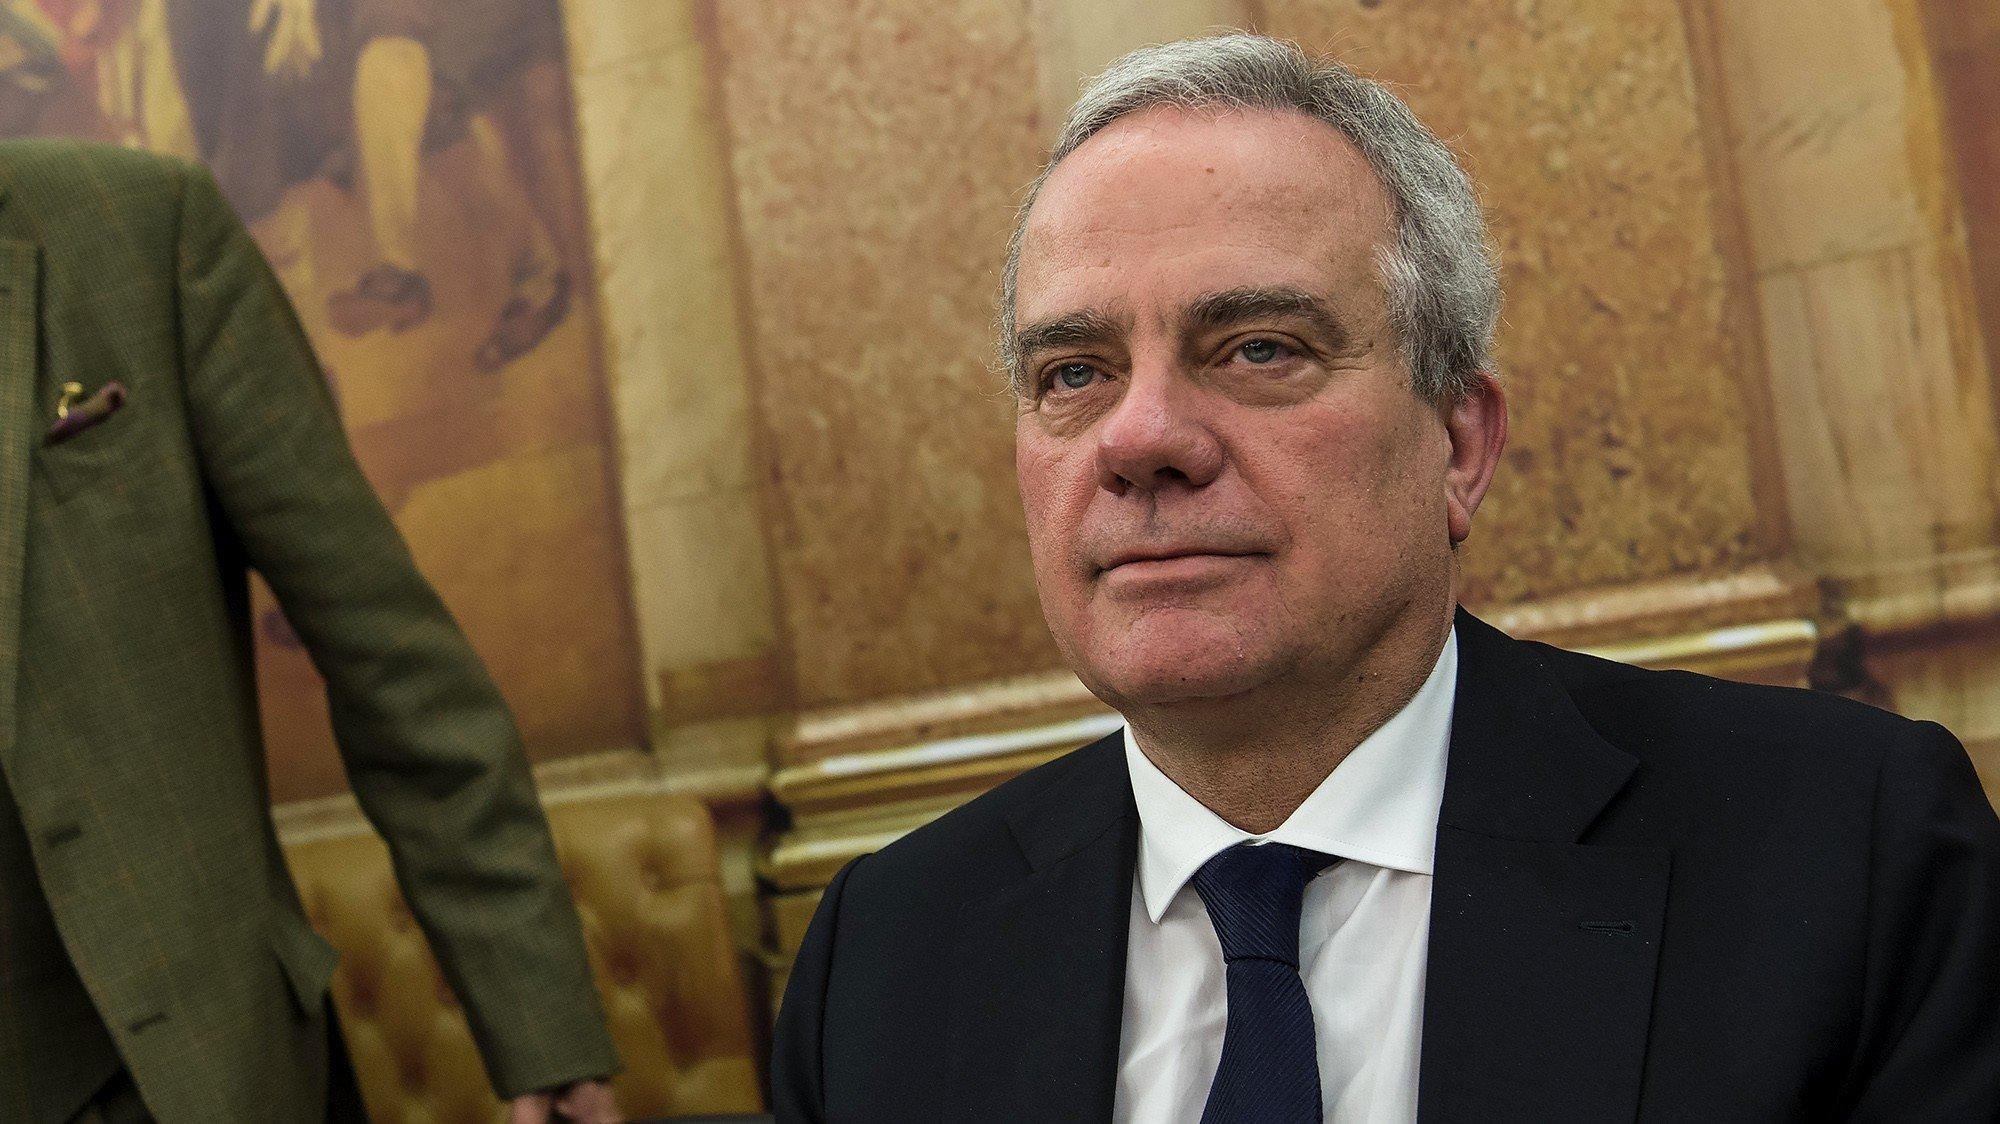 José Maria Ricciardi, ex-administrador do Banco Espírito Santo